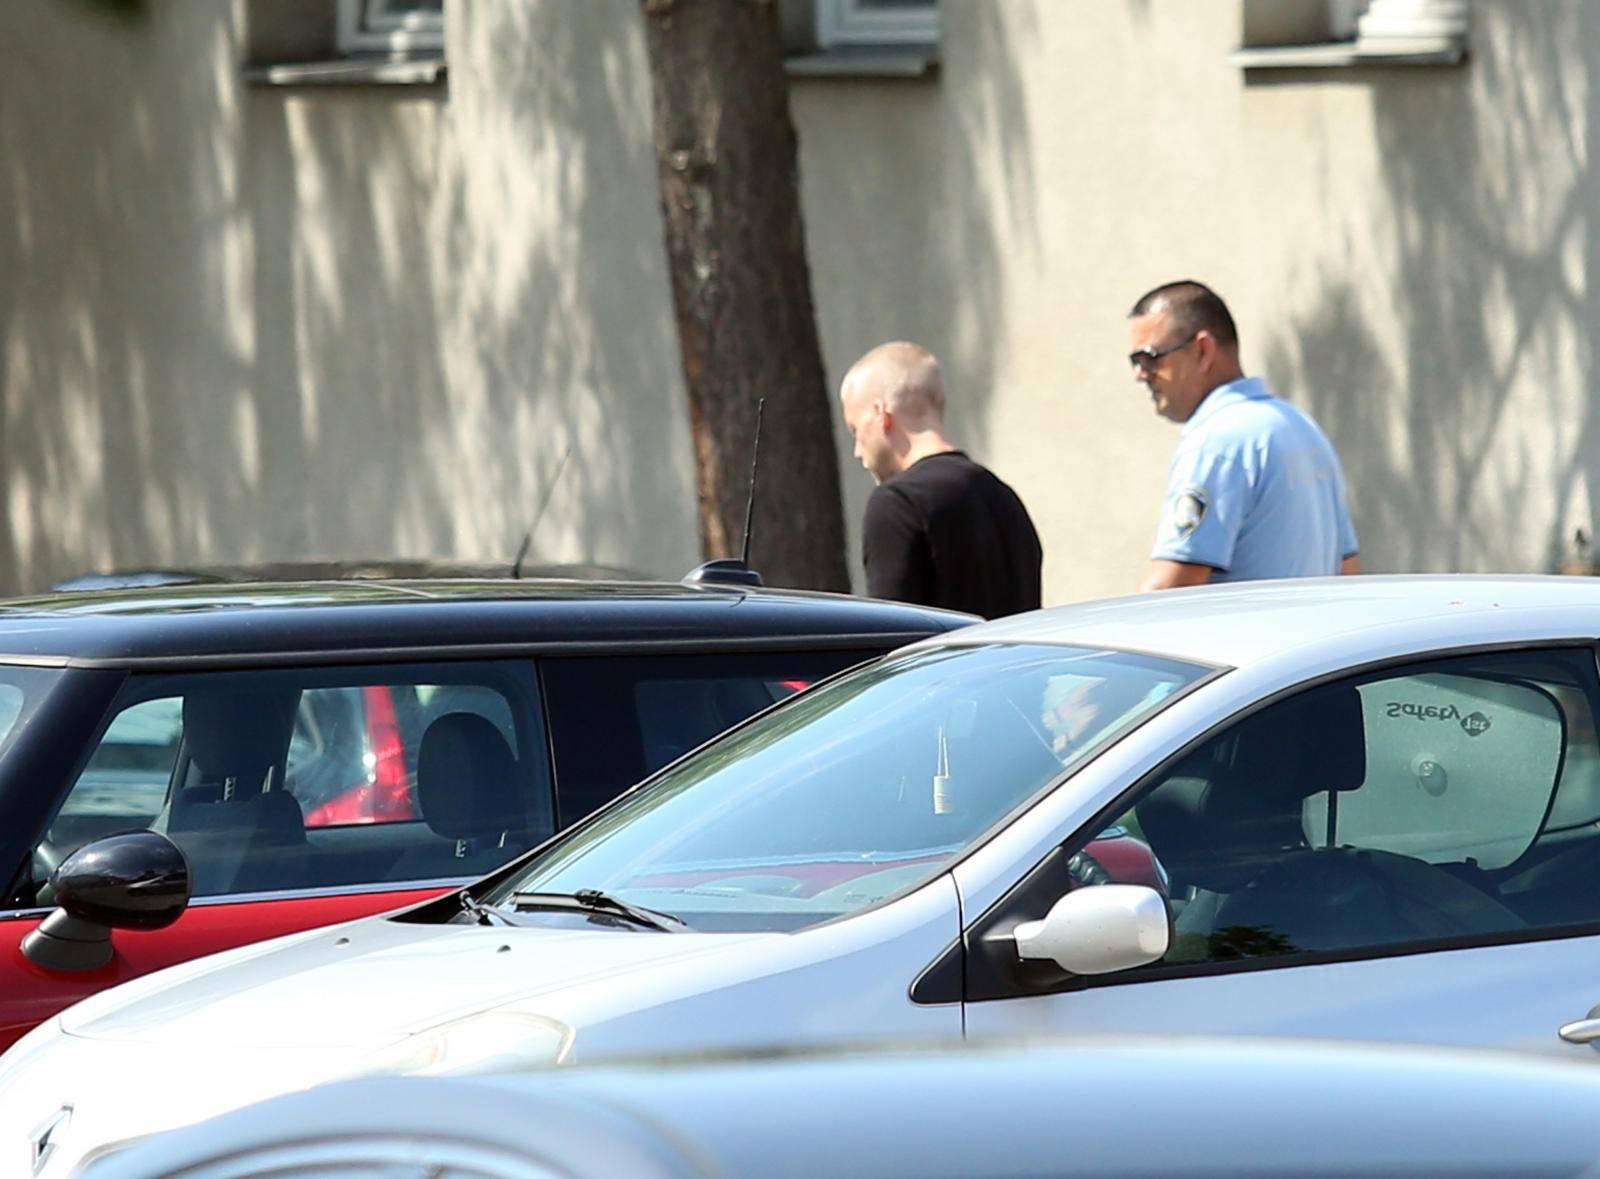 Hodao i fotografirao: Ozrenov otac htio uzeti torbe iz auta?